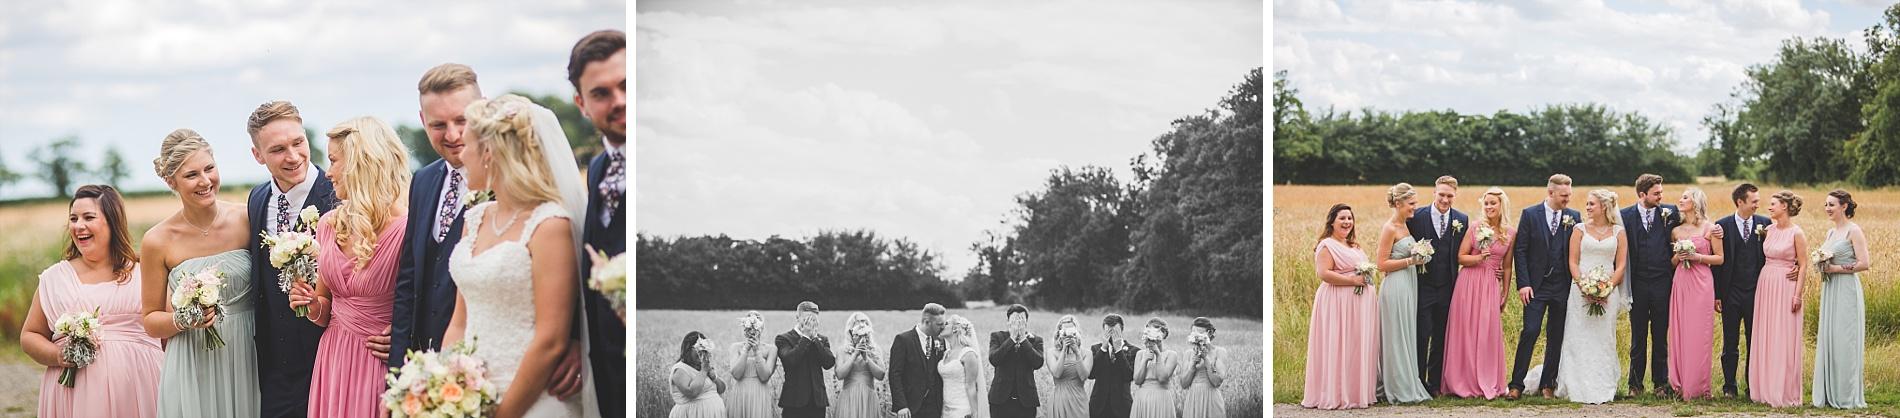 hall farm wedding photography (58)